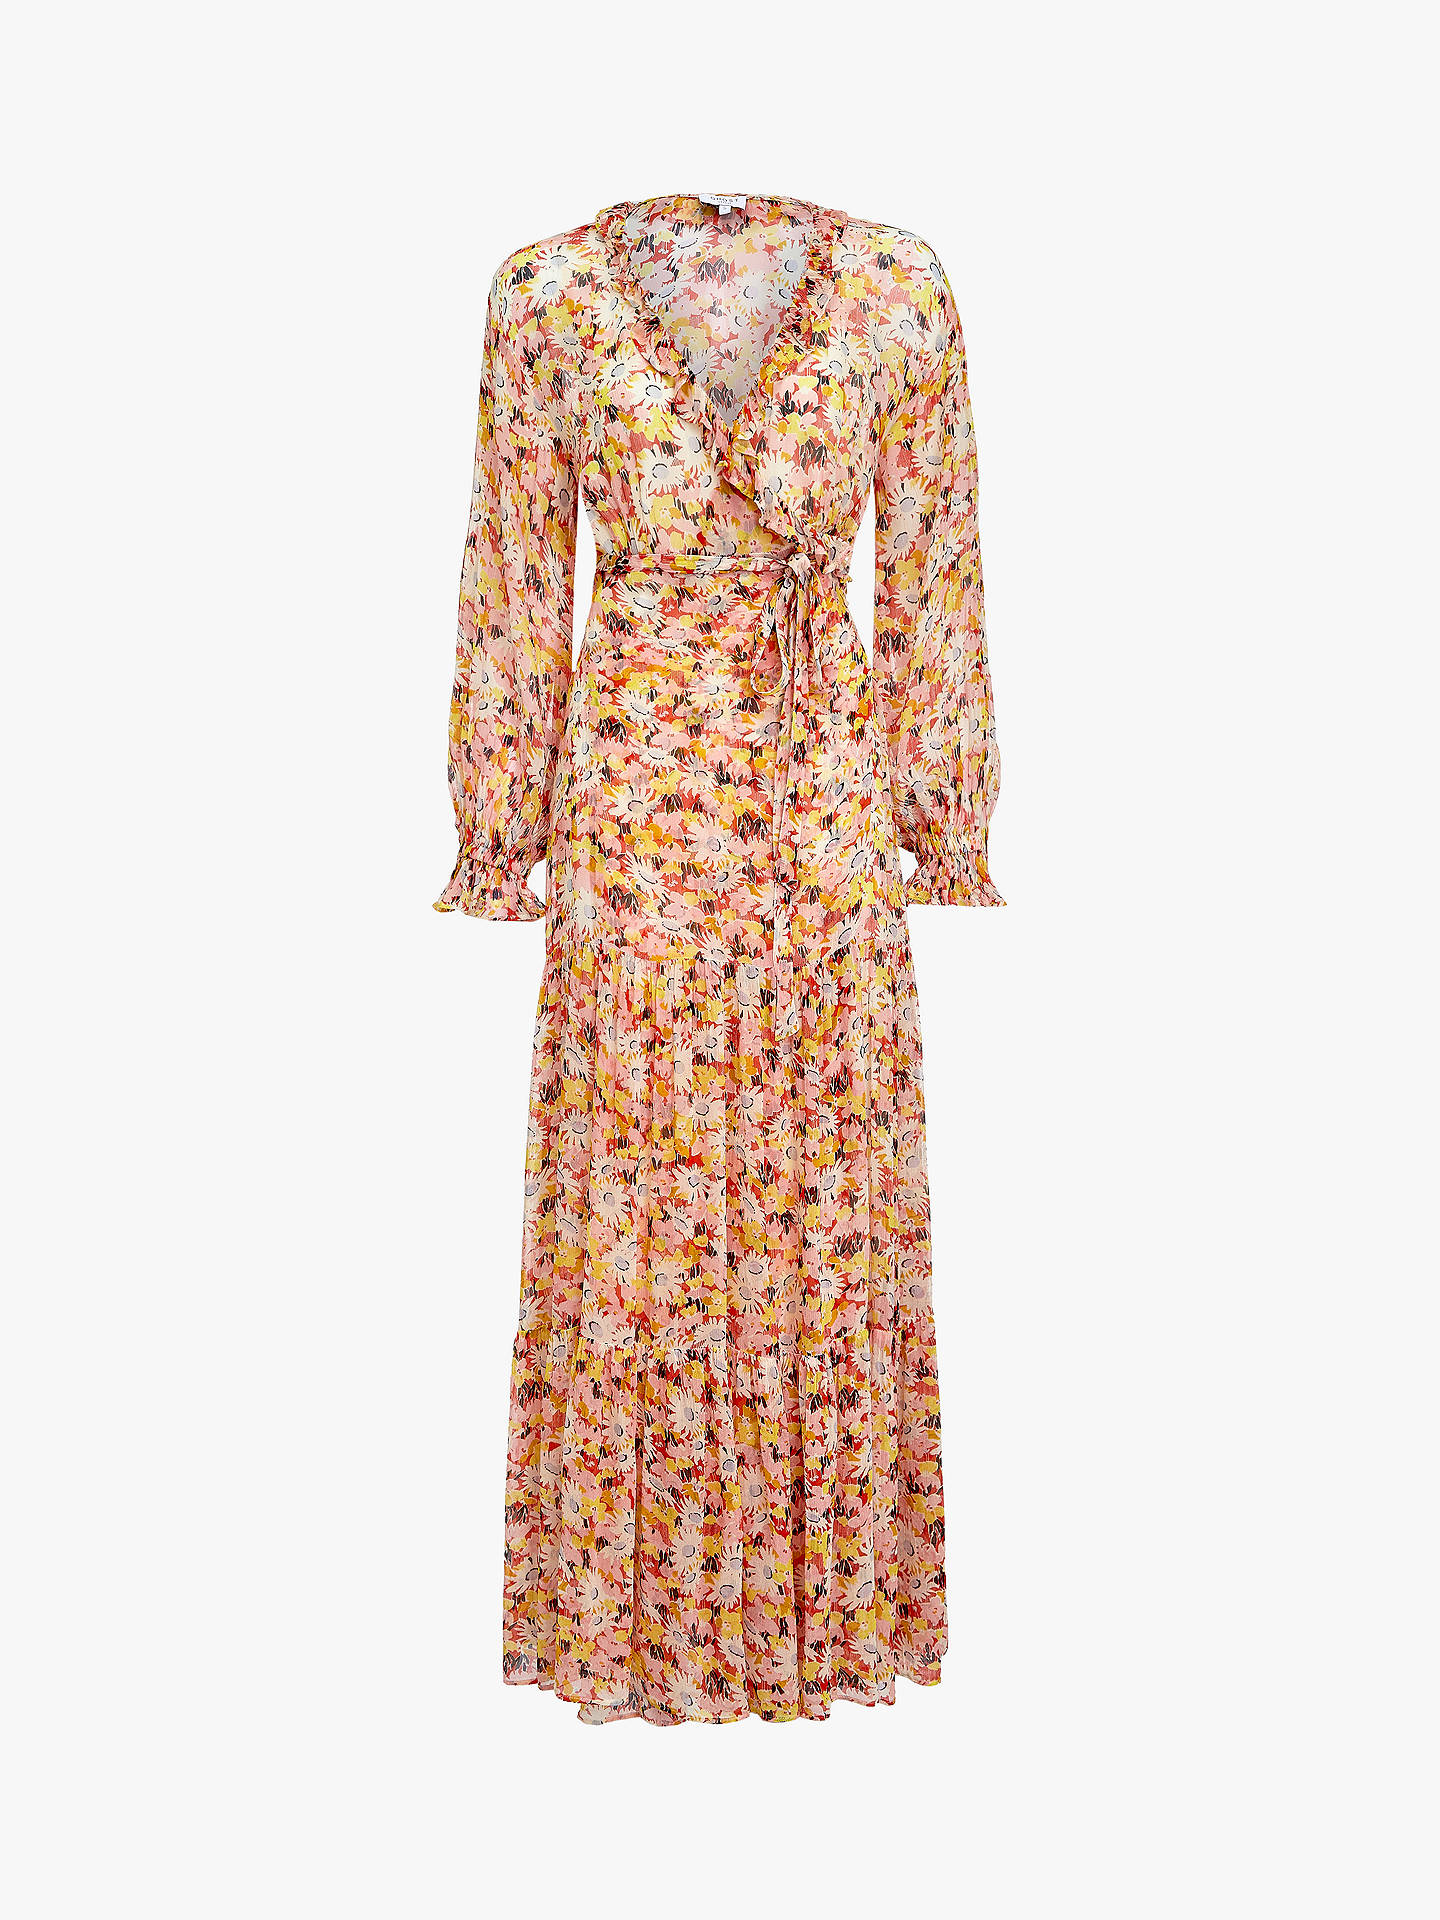 5a8843509e42 ... Buy Ghost Jasmine Wrap Dress, Retro Floral, XS Online at johnlewis.com  ...